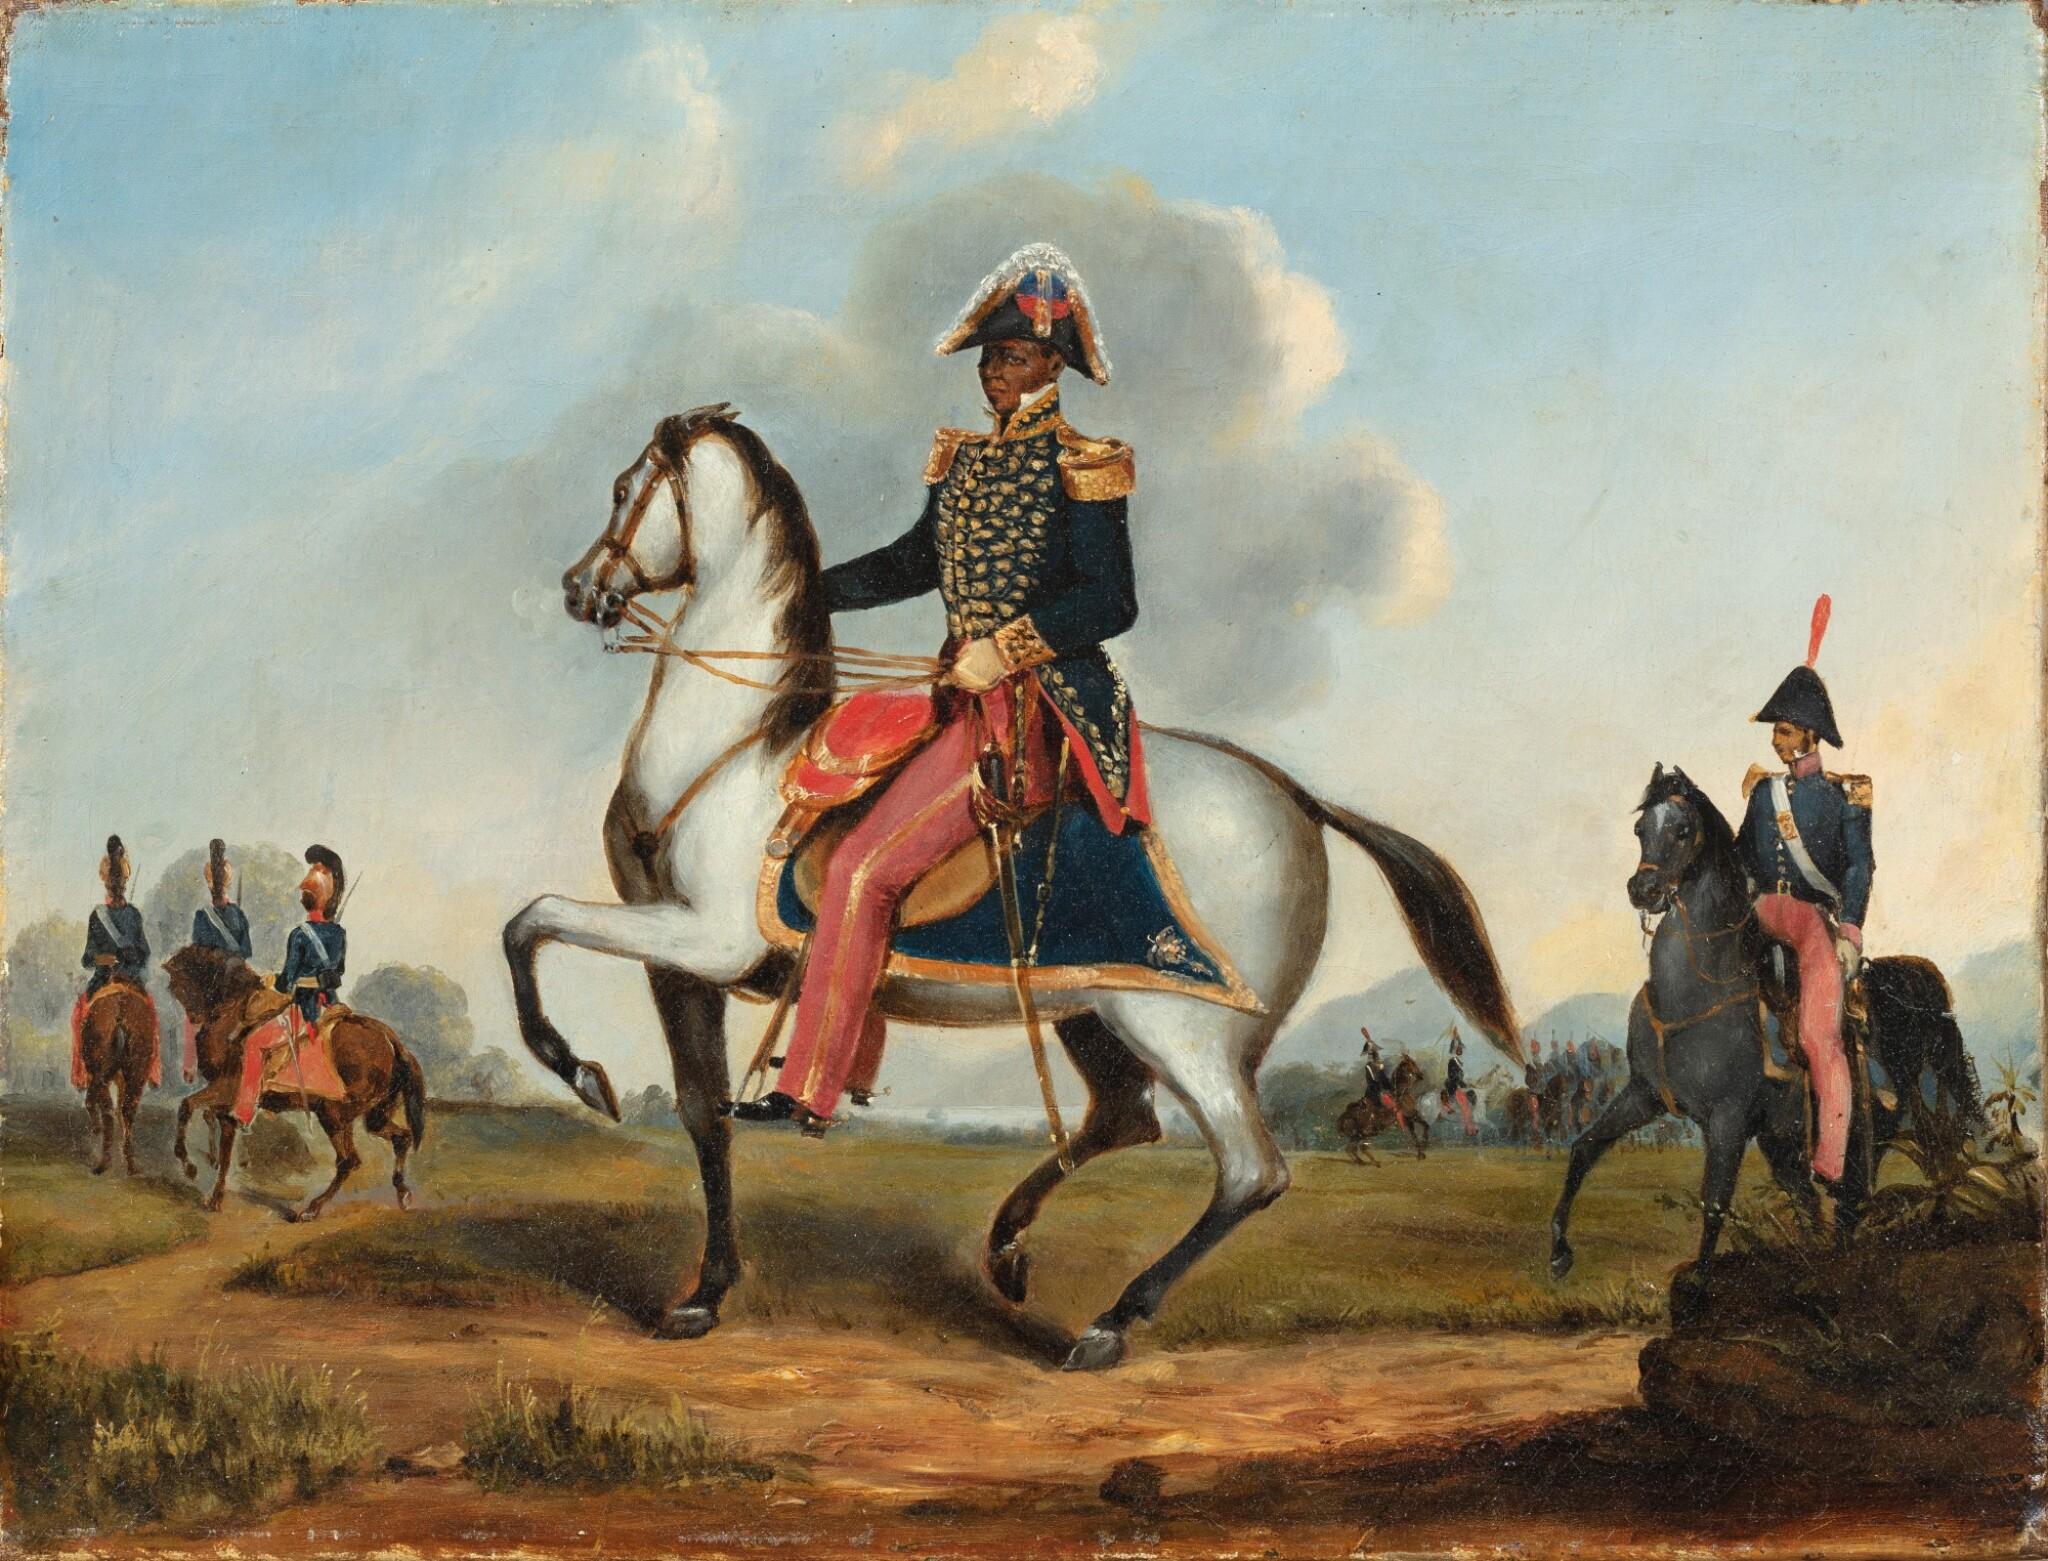 View full screen - View 1 of Lot 198. Portrait of François Dominique Toussaint Louverture (1743-1803) in uniform, mounted on his horse.